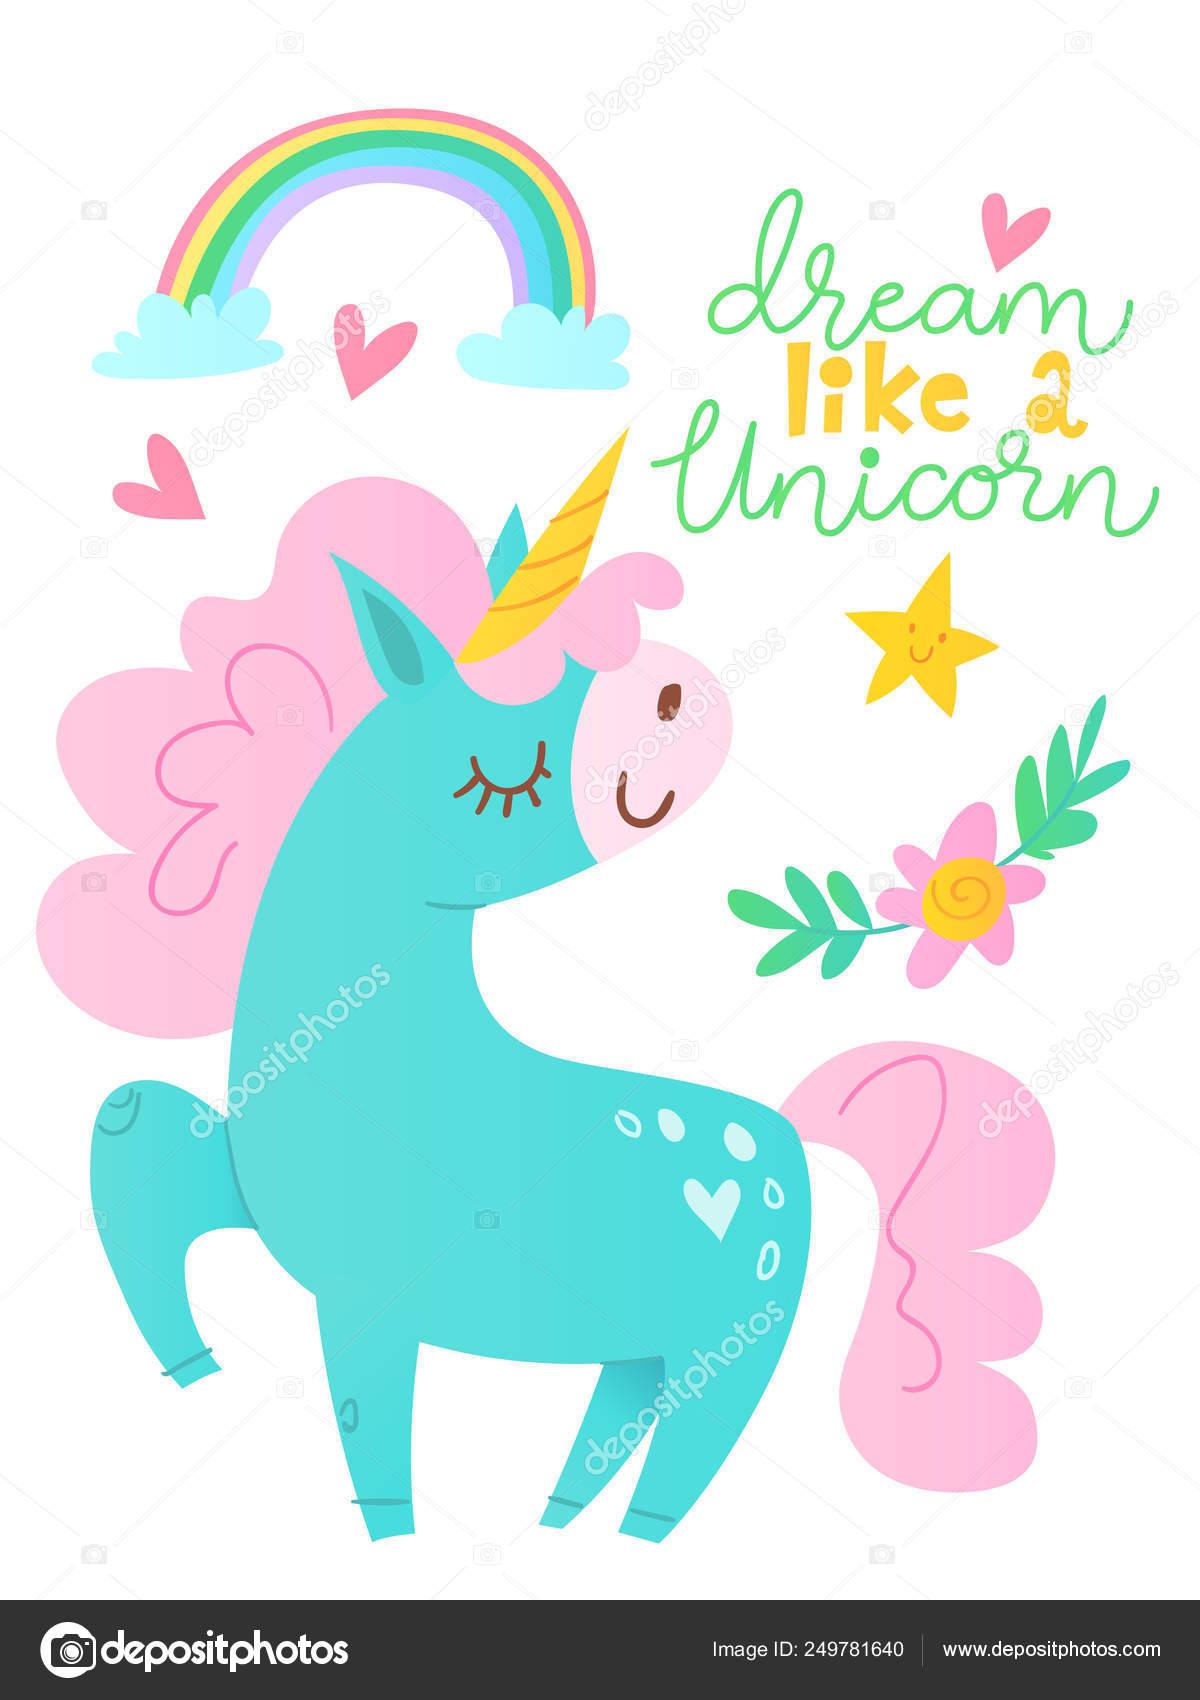 Tarjeta Vector Lindo Personaje Dibujos Animados Unicornio